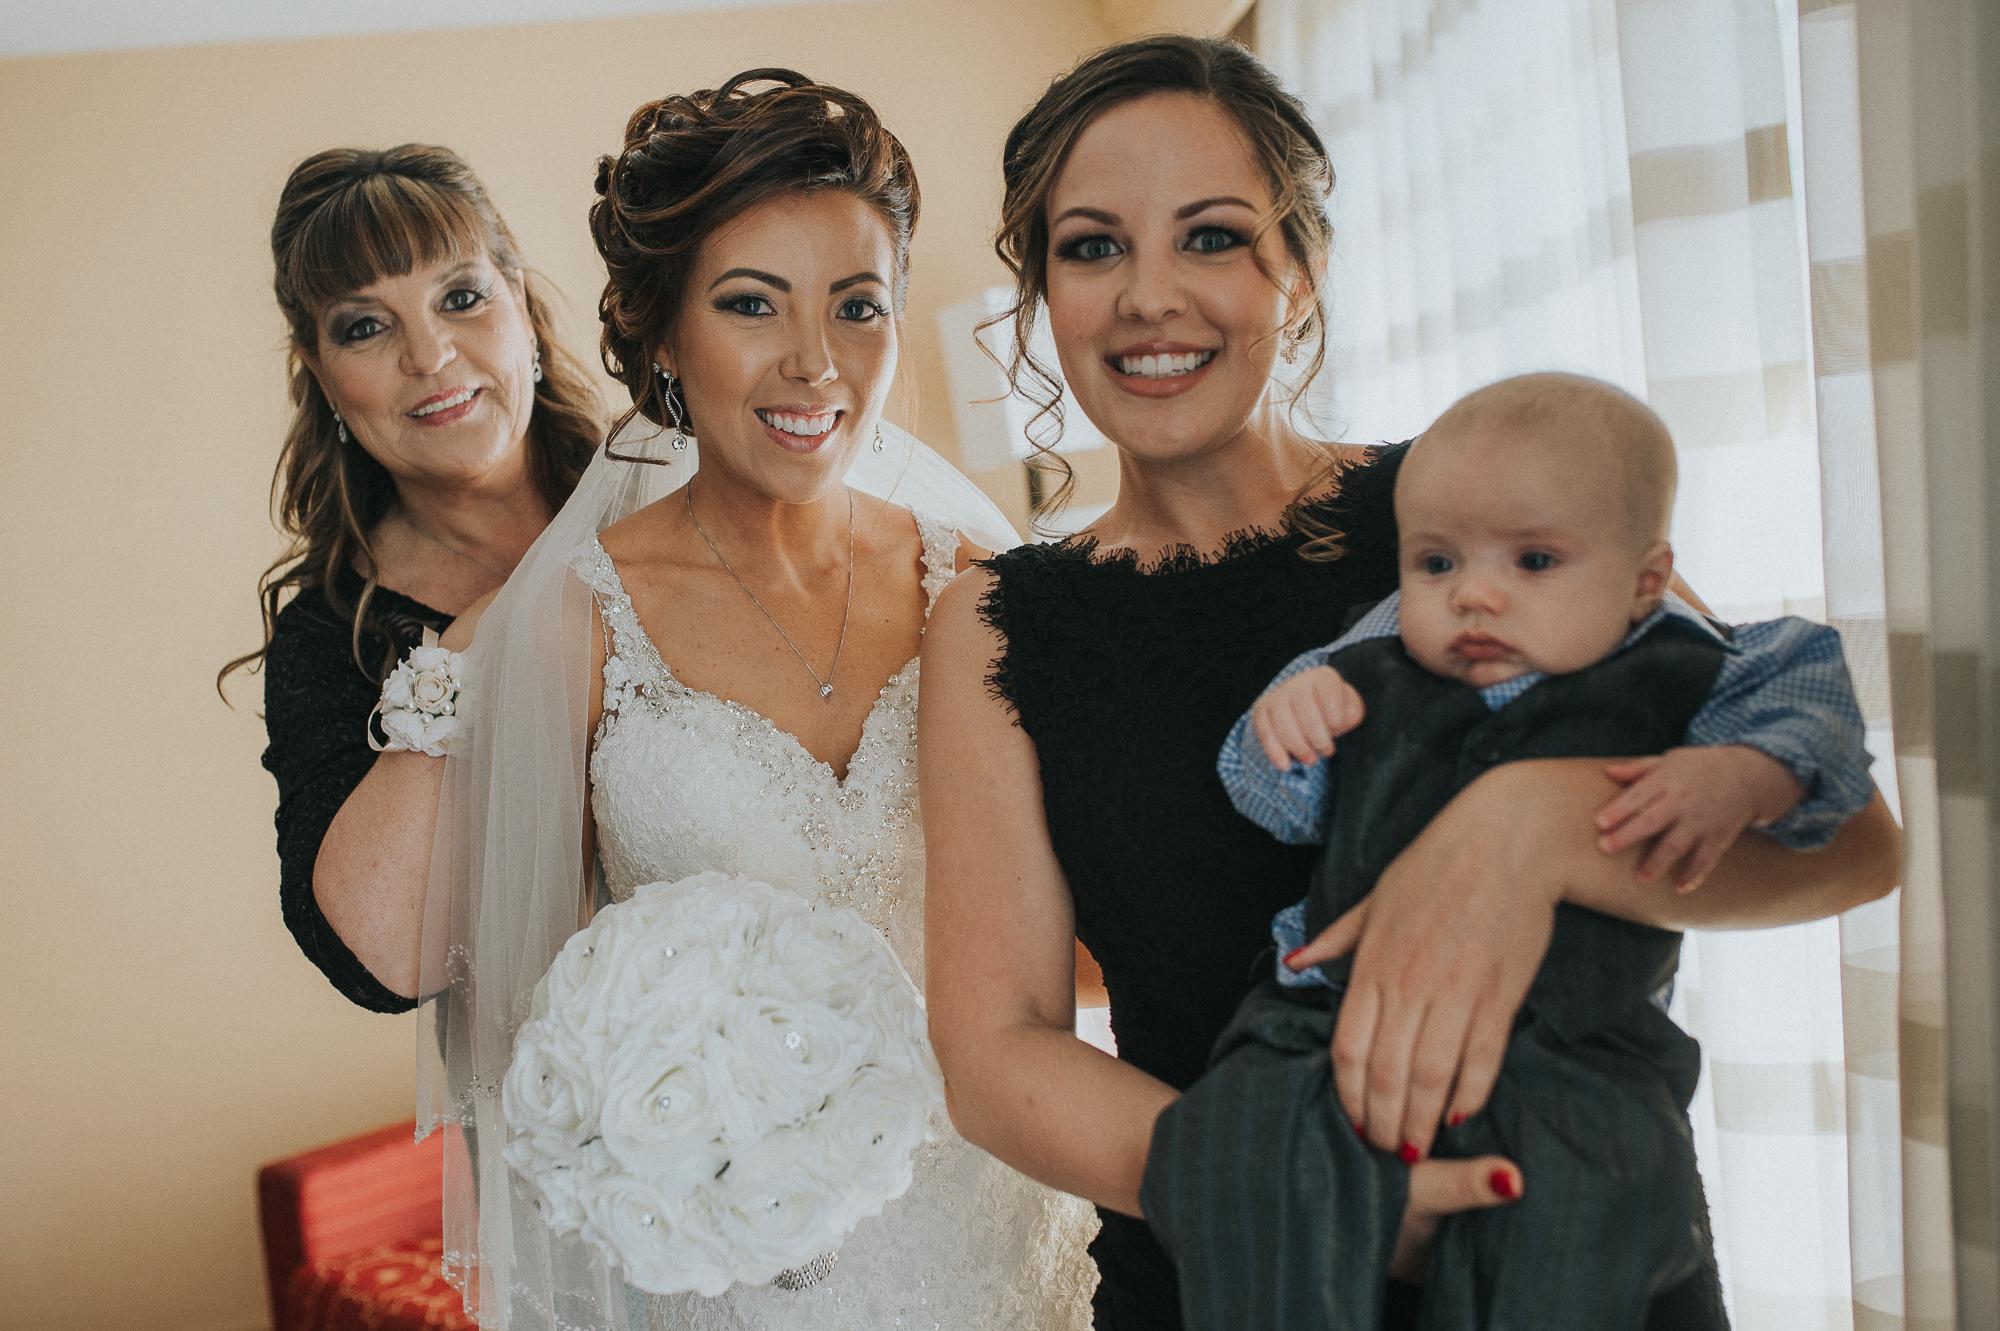 Christina-and-Gene-Wedding-Marla-Rain-Photography-106.jpg